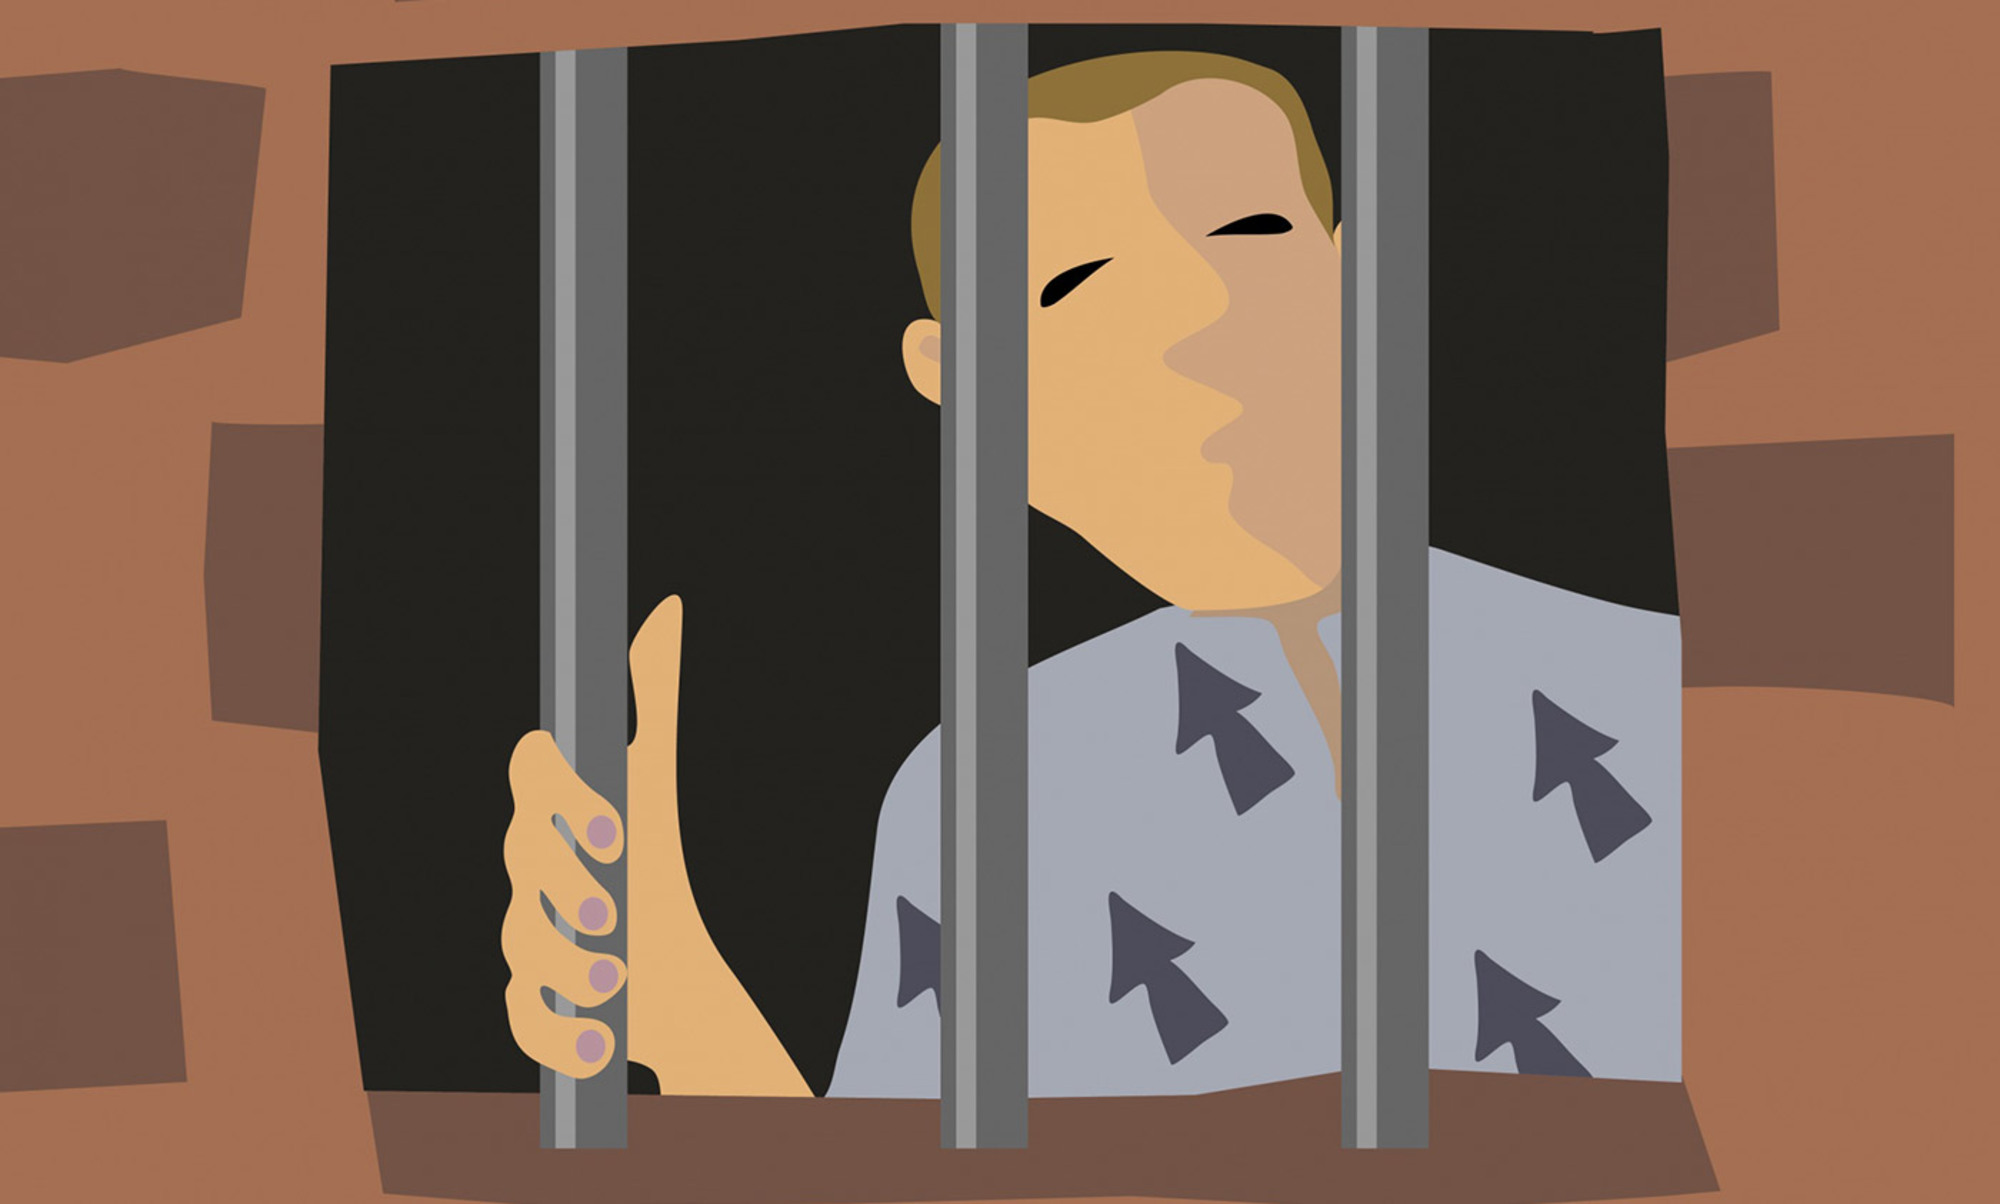 How US prisons violate three principles of criminal justice